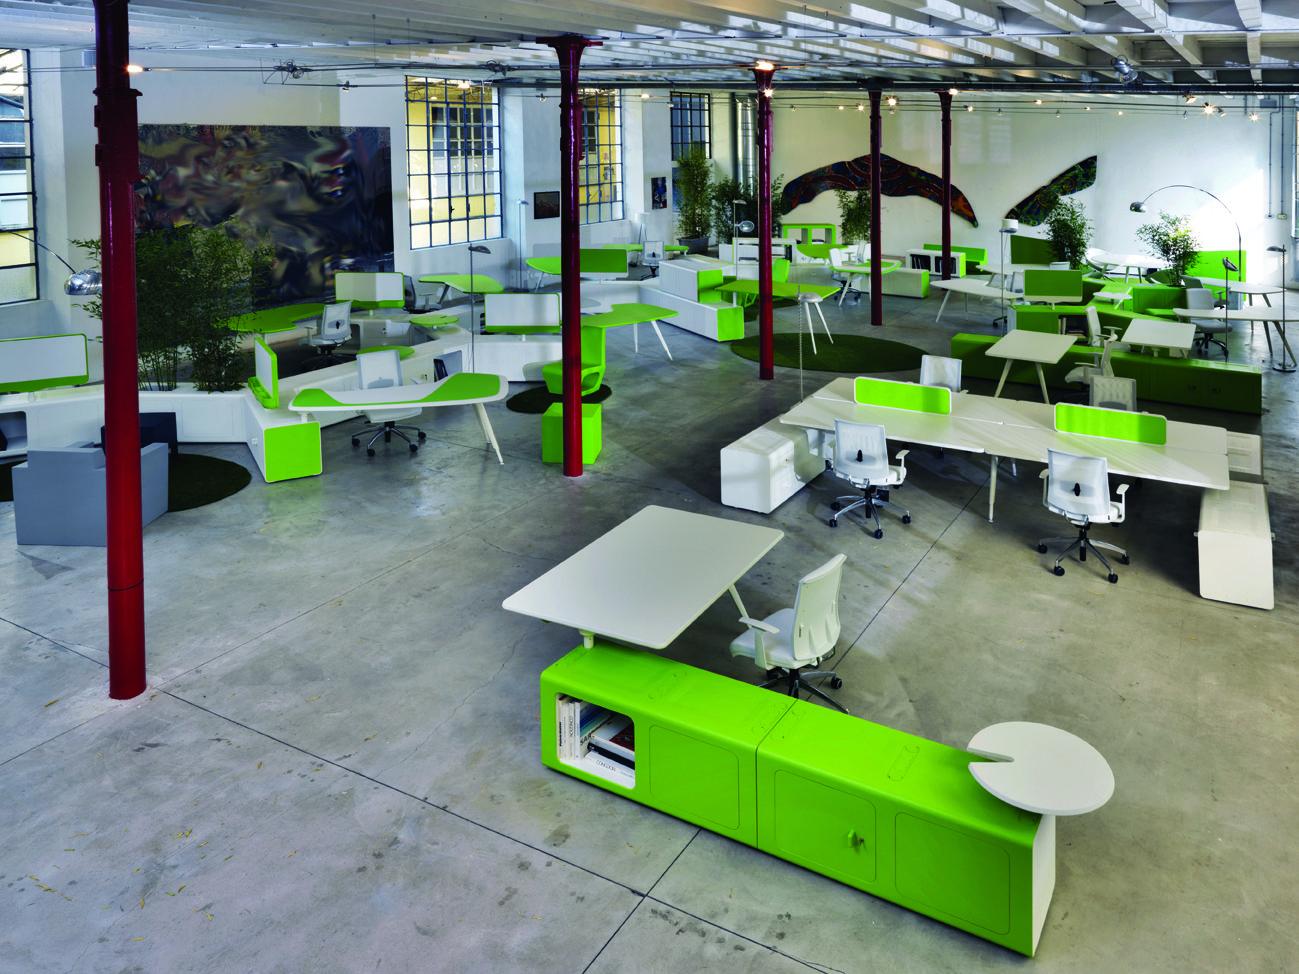 Oficina creativa beta dise ado por pierandrei associati espacio aretha agente exclusivo para - Luckia oficinas madrid ...